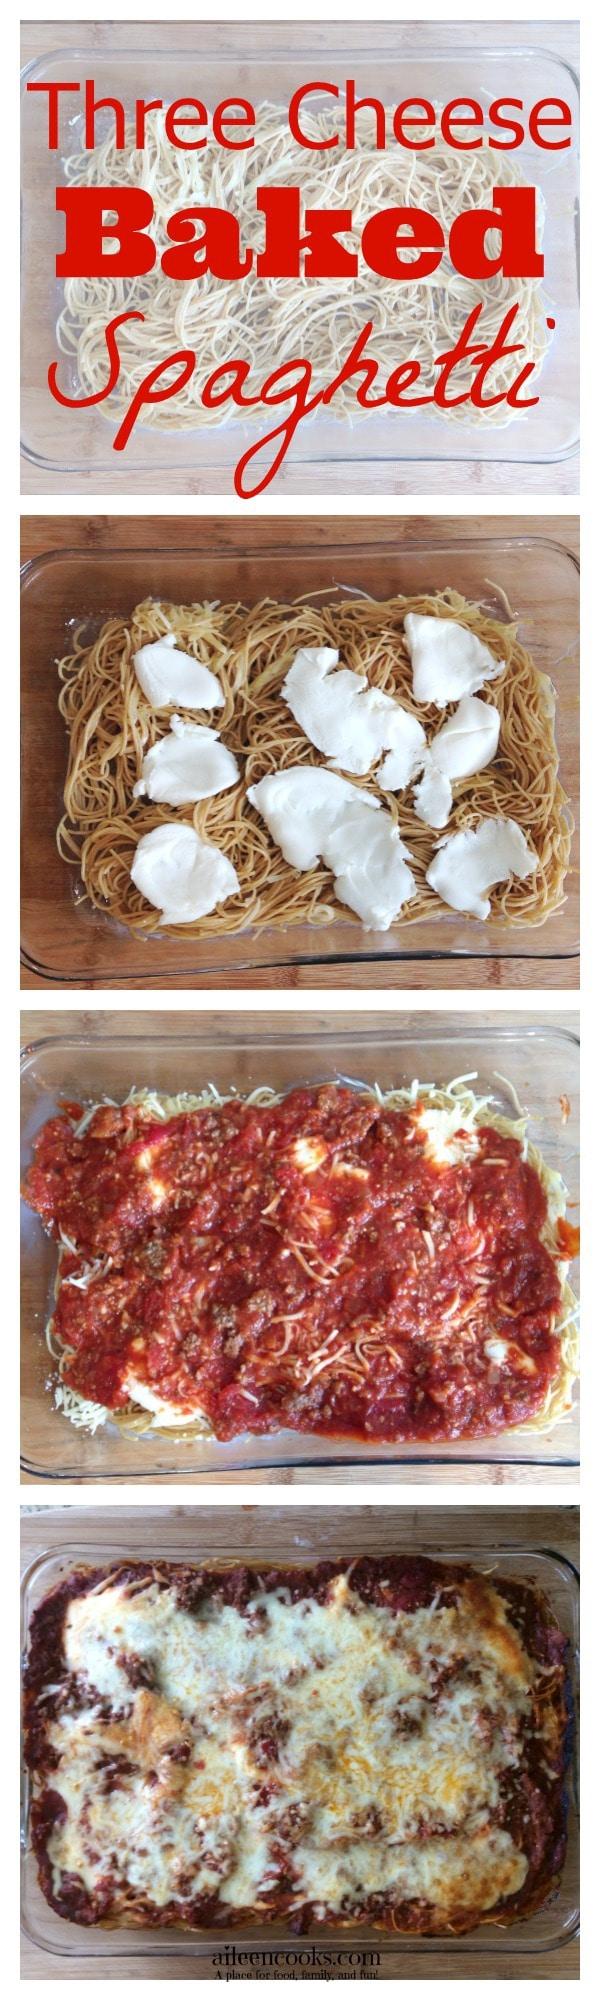 Three Cheese Baked Spaghetti 1